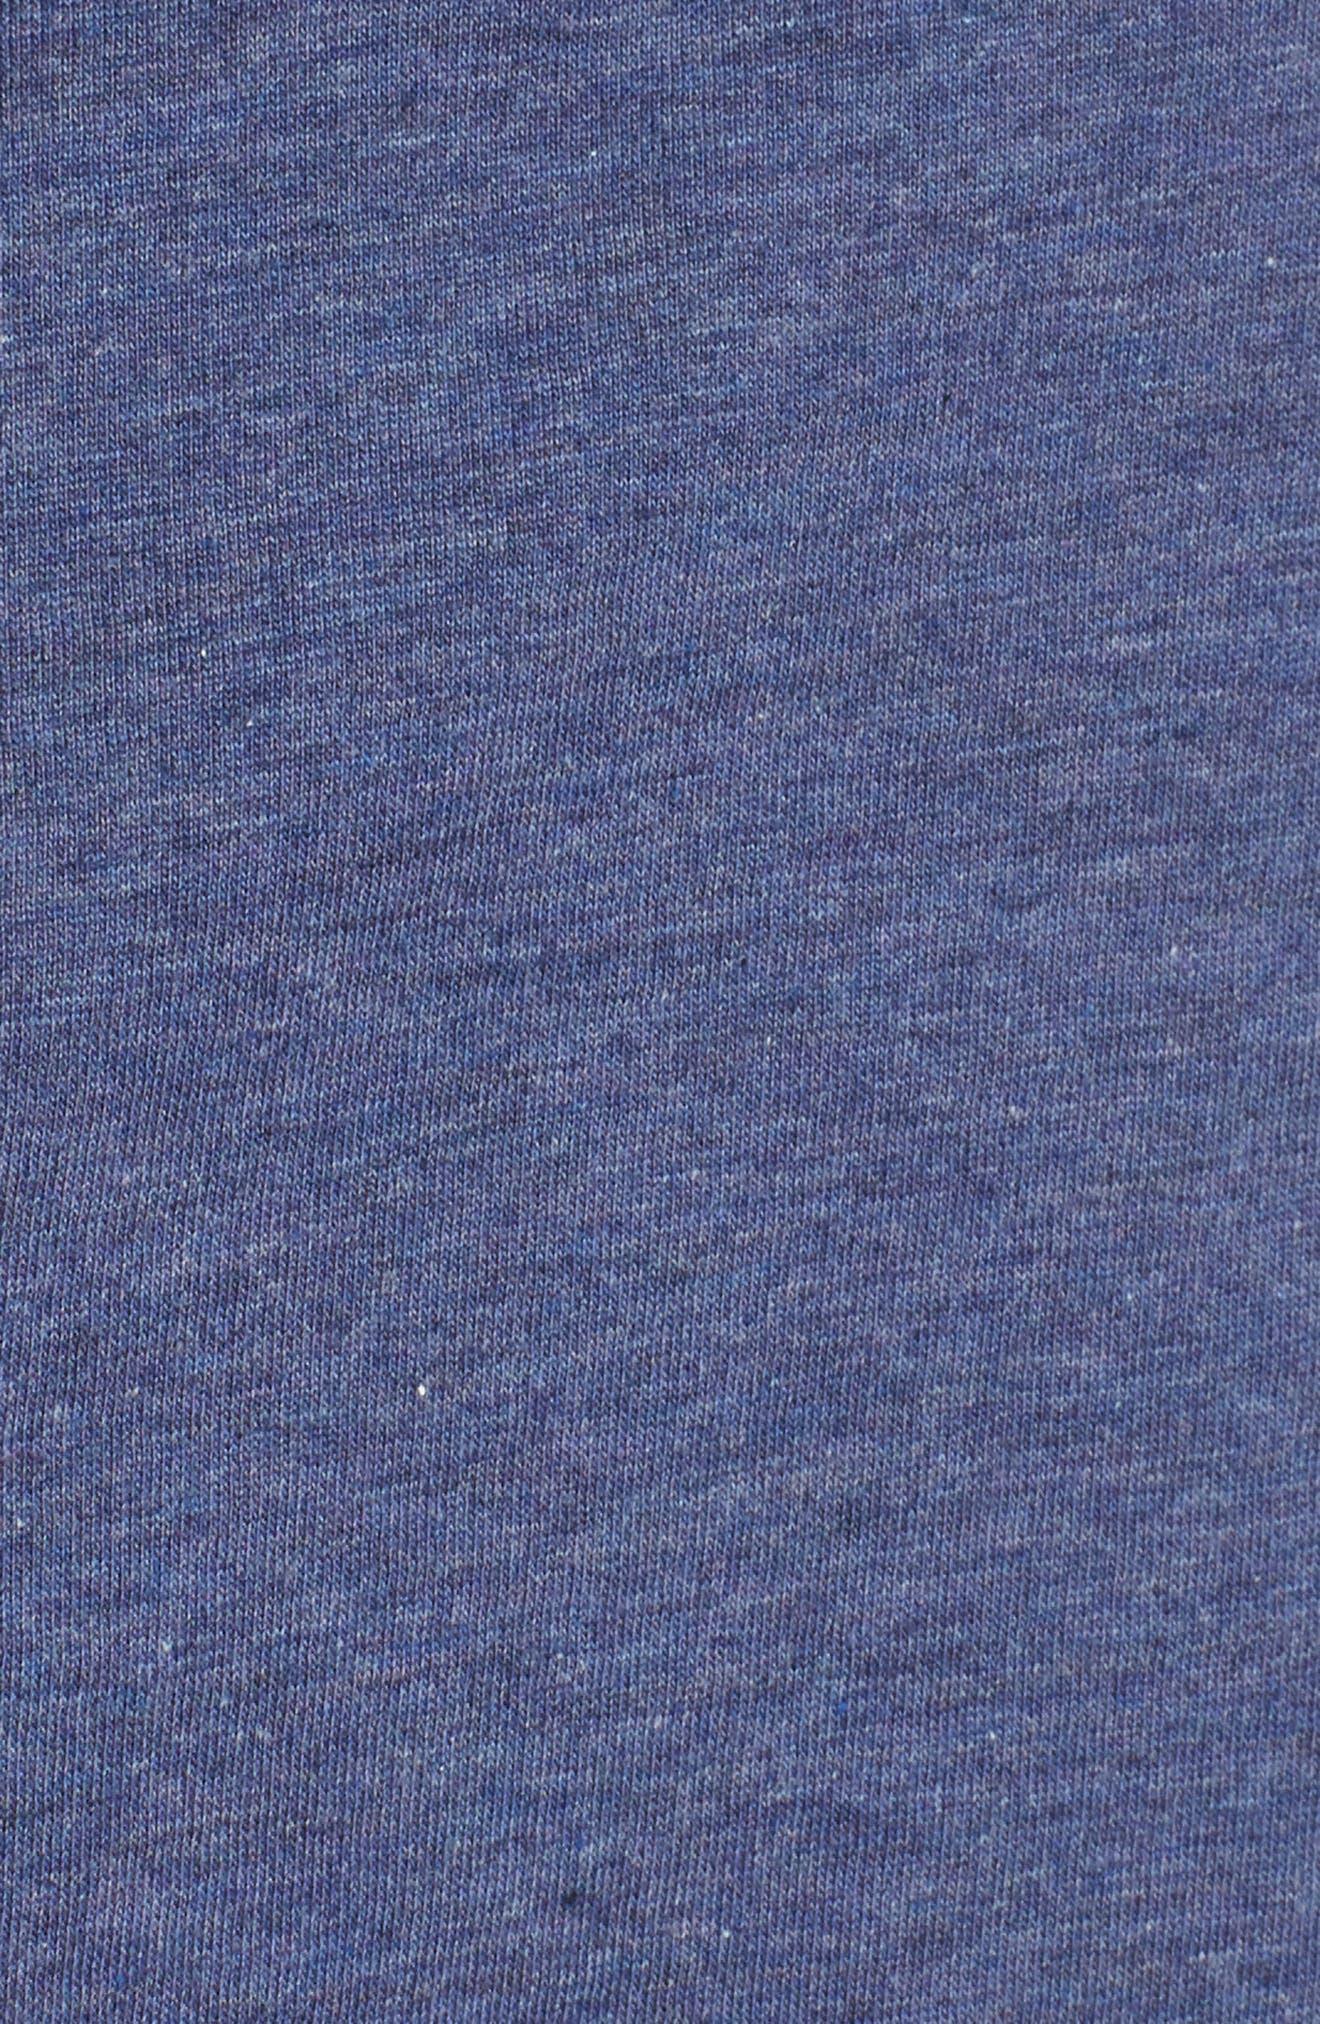 3-Pack Knit Boxers,                             Alternate thumbnail 6, color,                             426